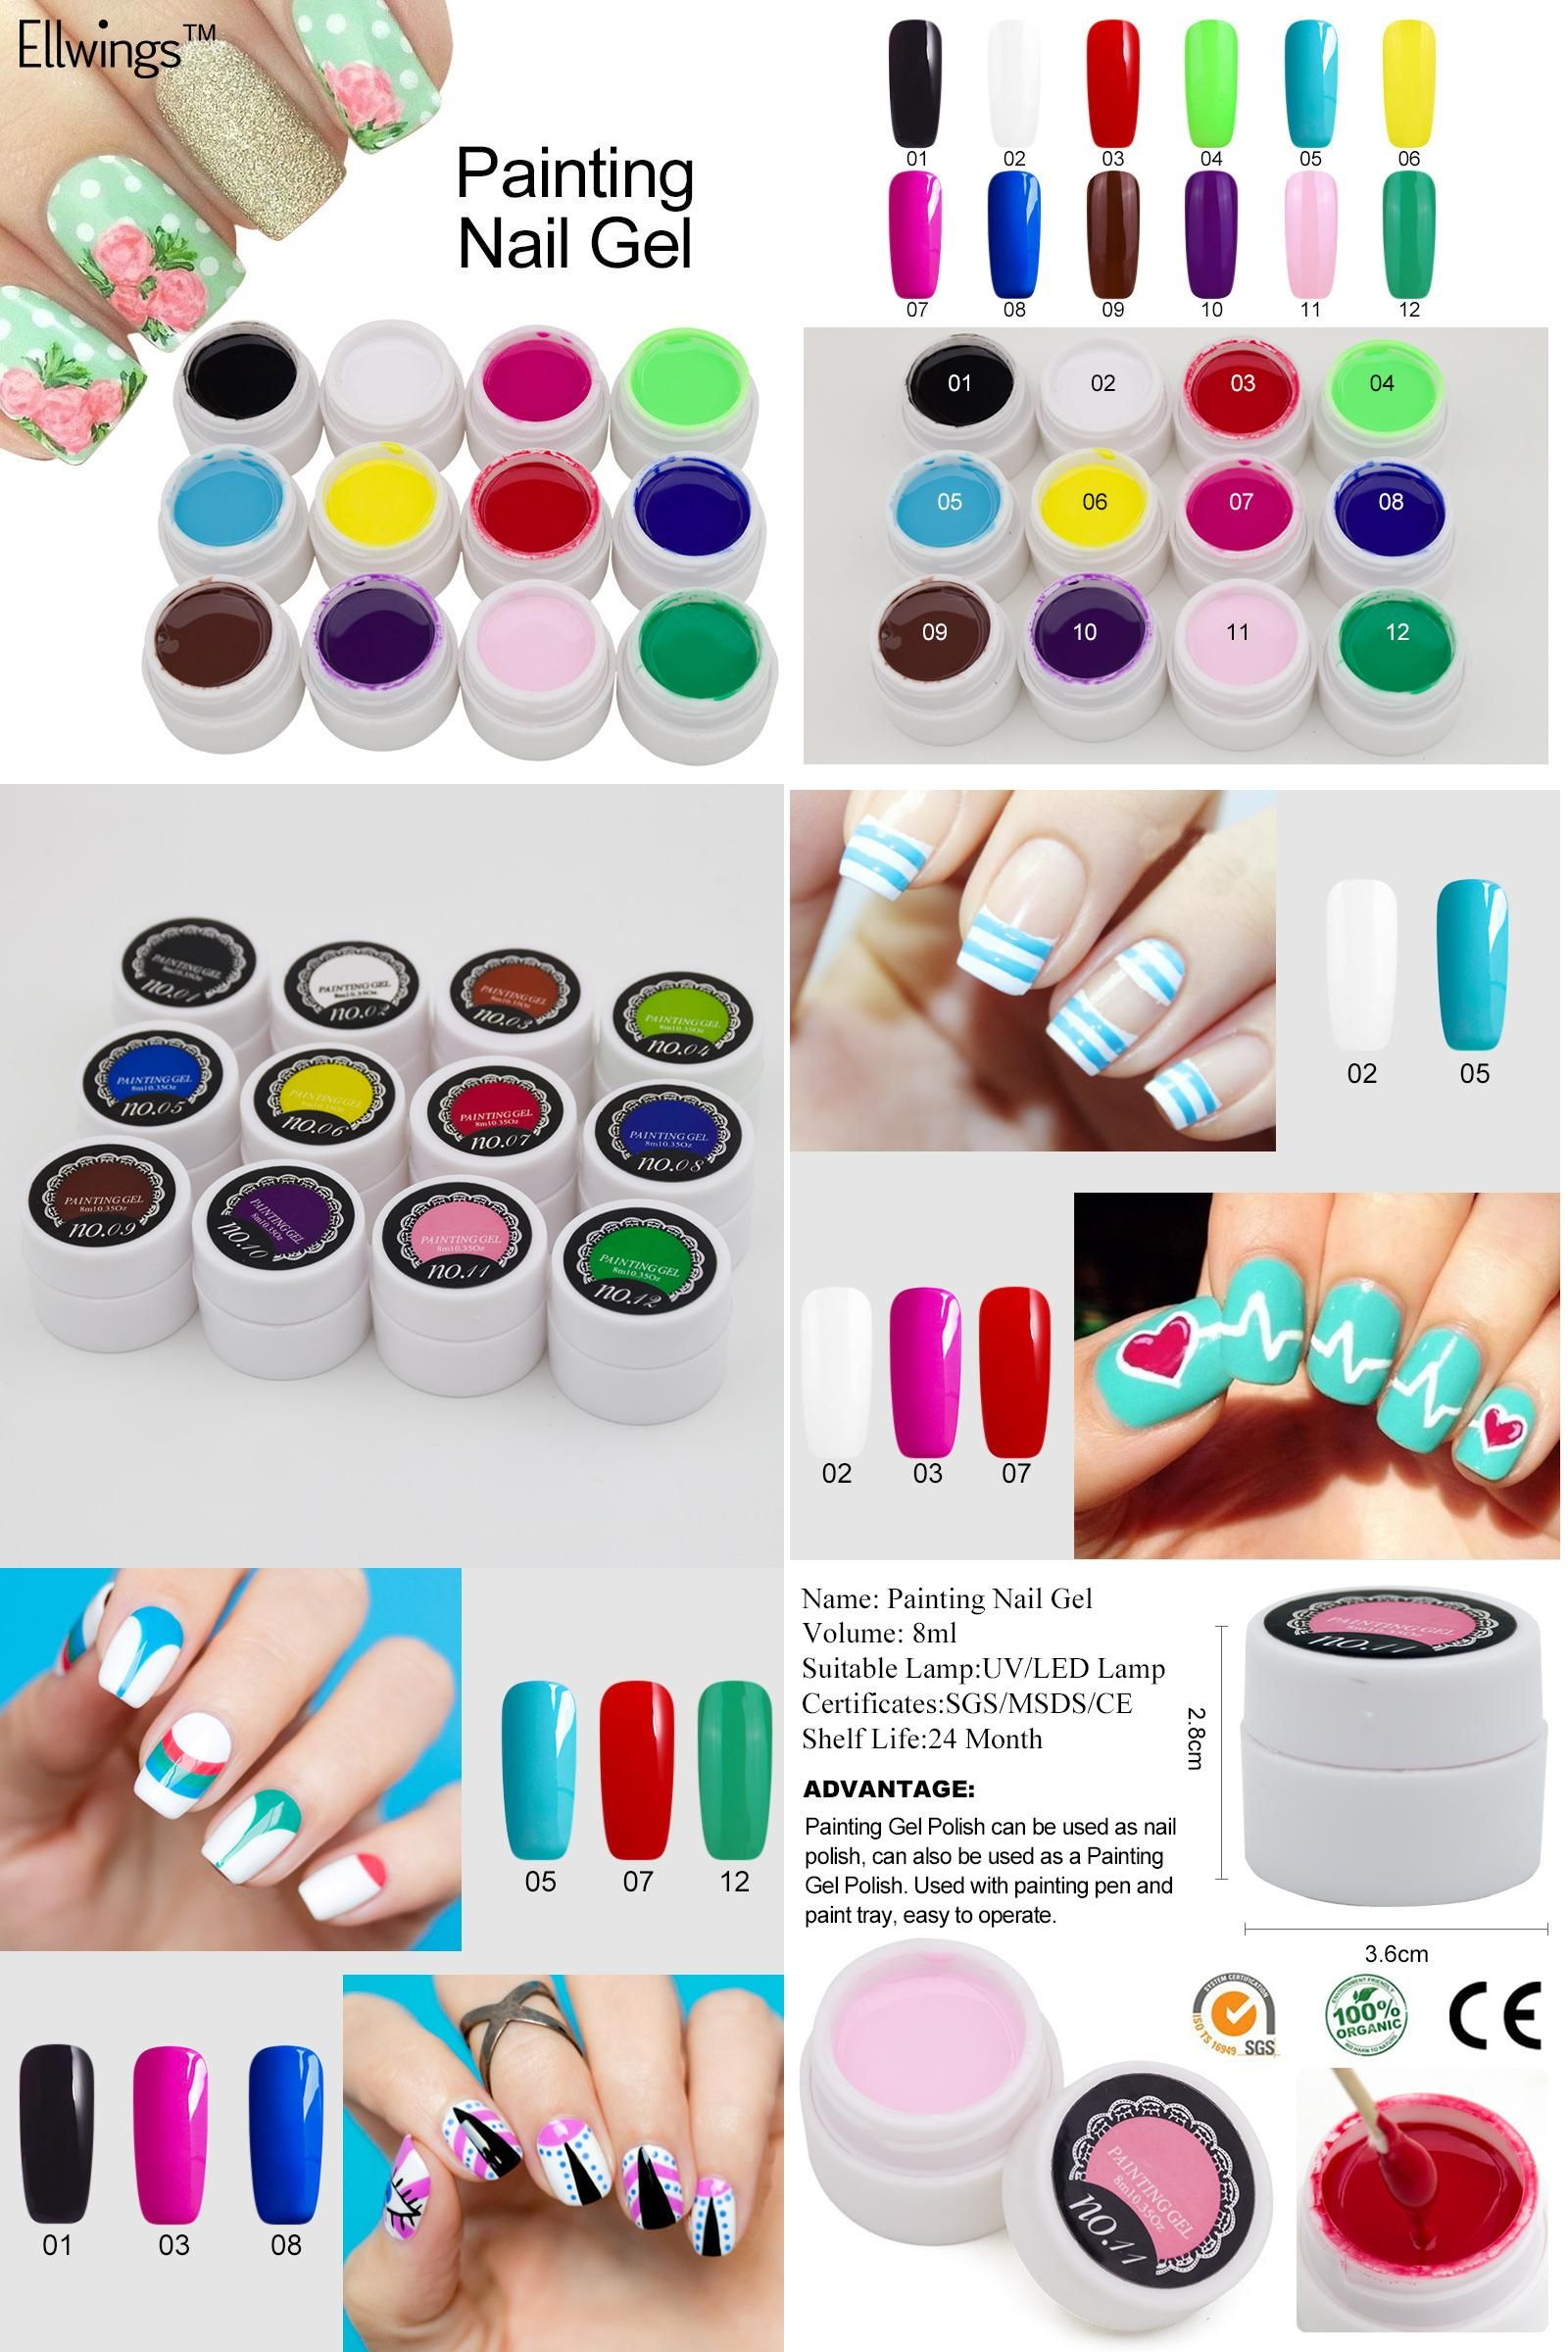 Visit to Buy] Ellwings 3D Glitter Painting Nail Gel Polish Semi ...